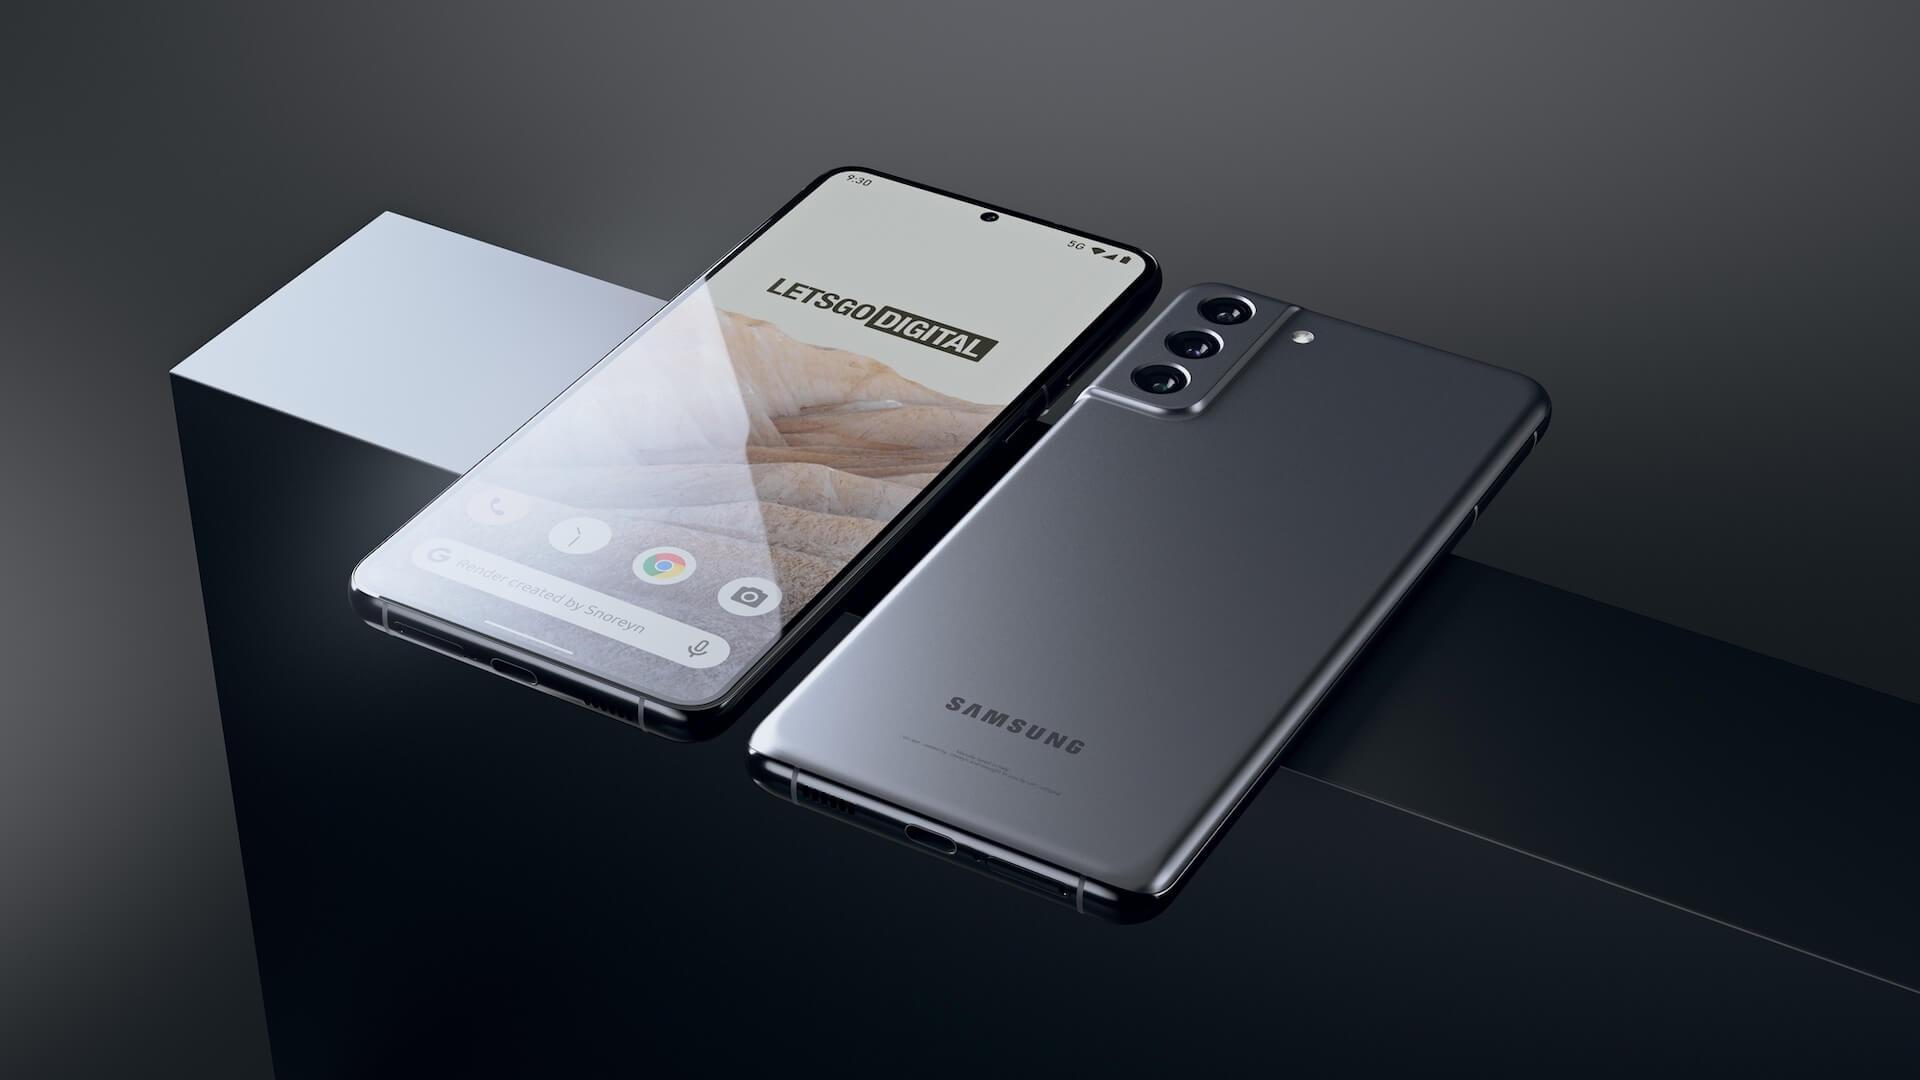 Дизайн Samsung Galaxy S21 FE 5G раскрыт на фото-рендерах